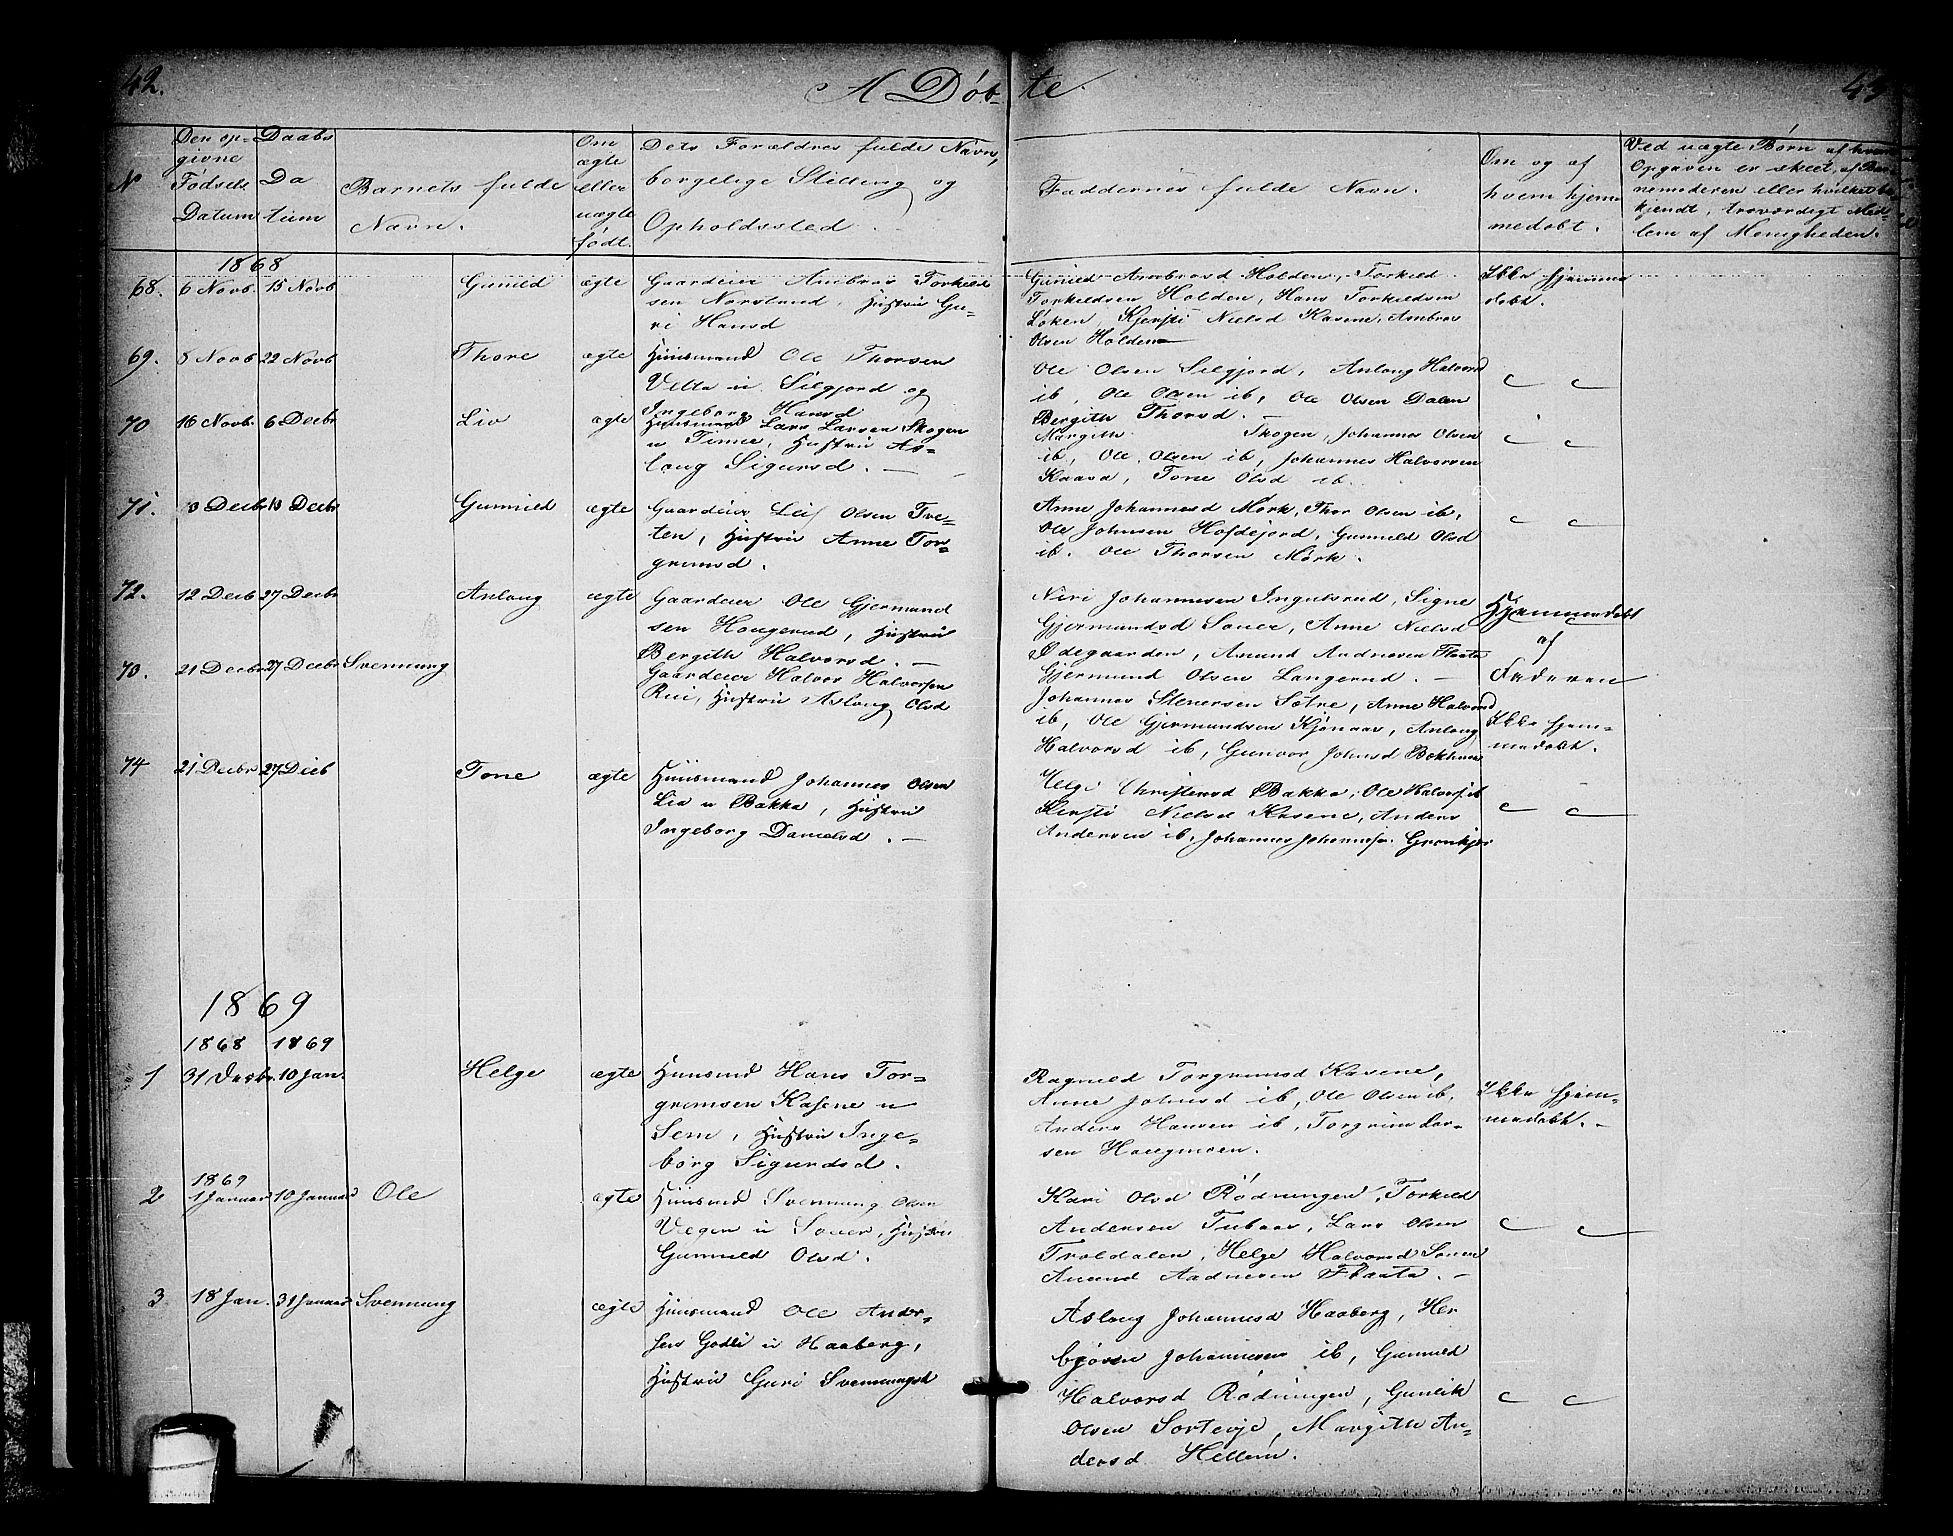 SAKO, Heddal kirkebøker, G/Ga/L0001: Klokkerbok nr. I 1, 1866-1878, s. 42-43